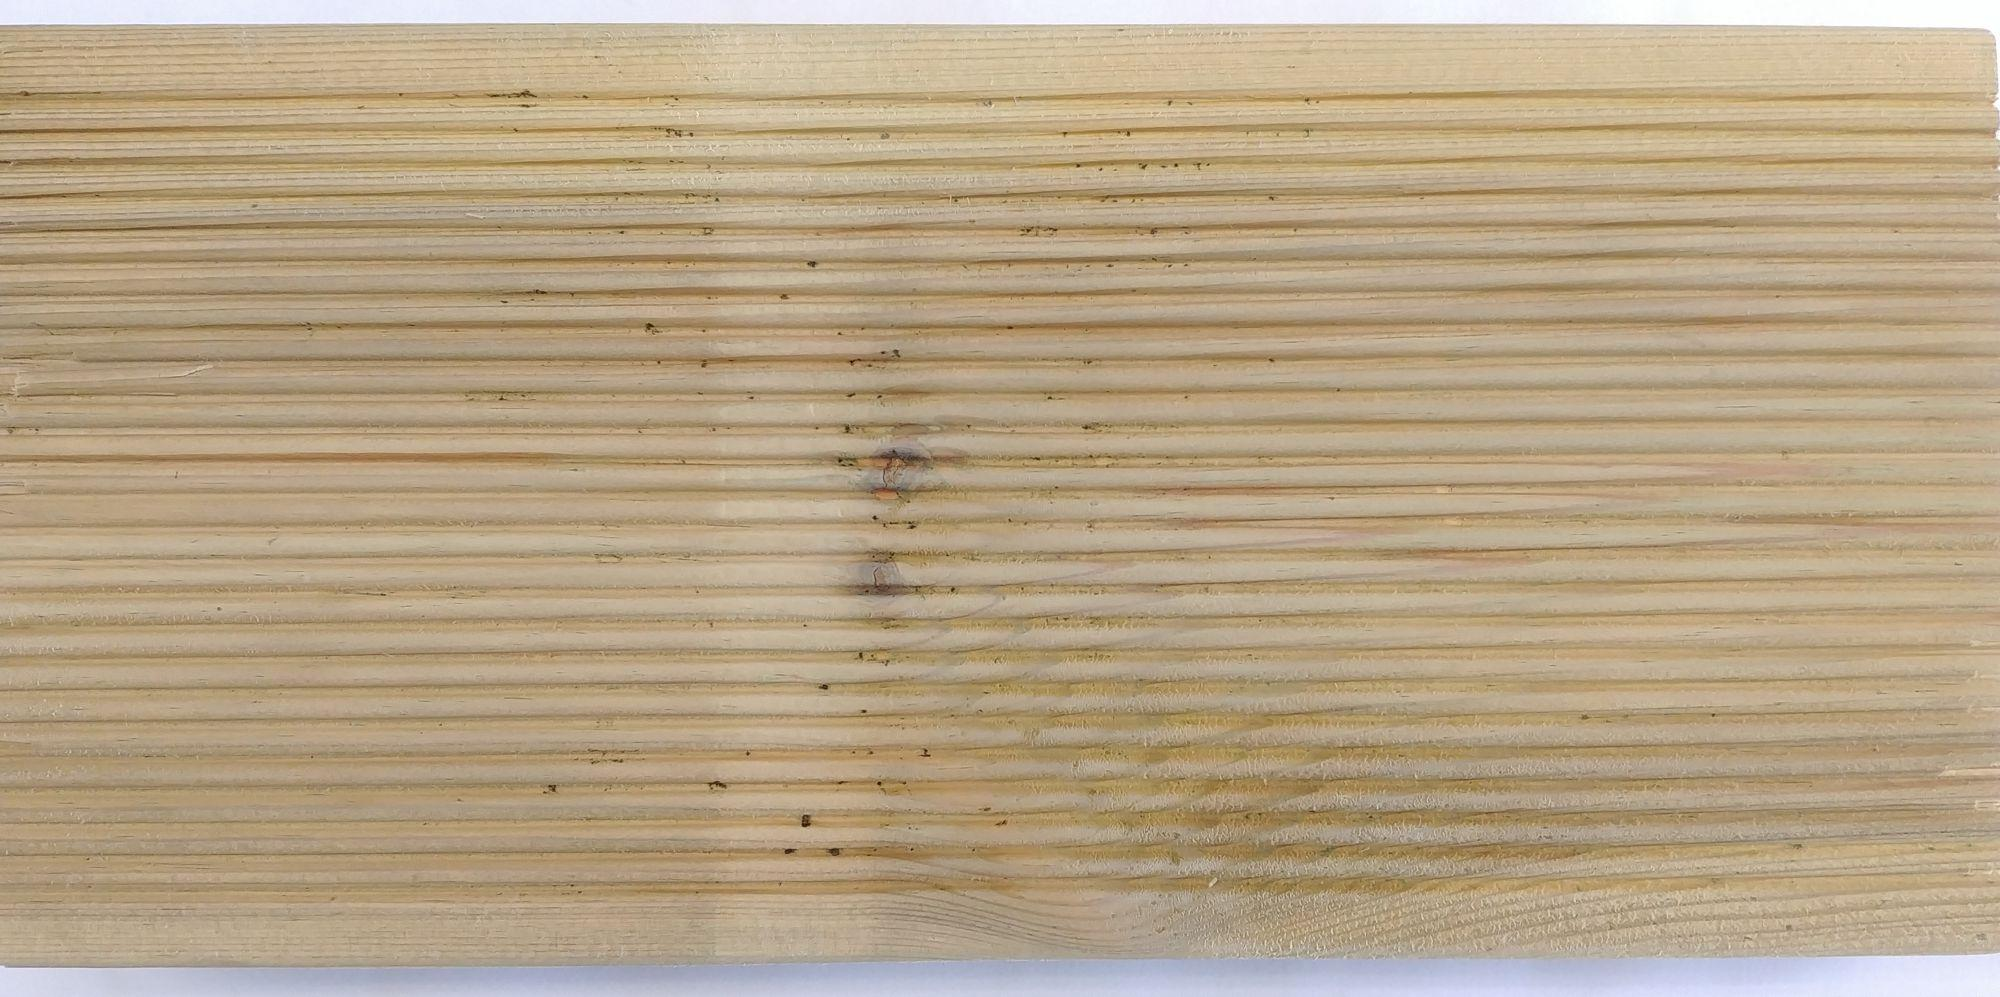 Pieza madera exterior pino tratado r4 145x45 4 metros - Madera de pino tratada ...